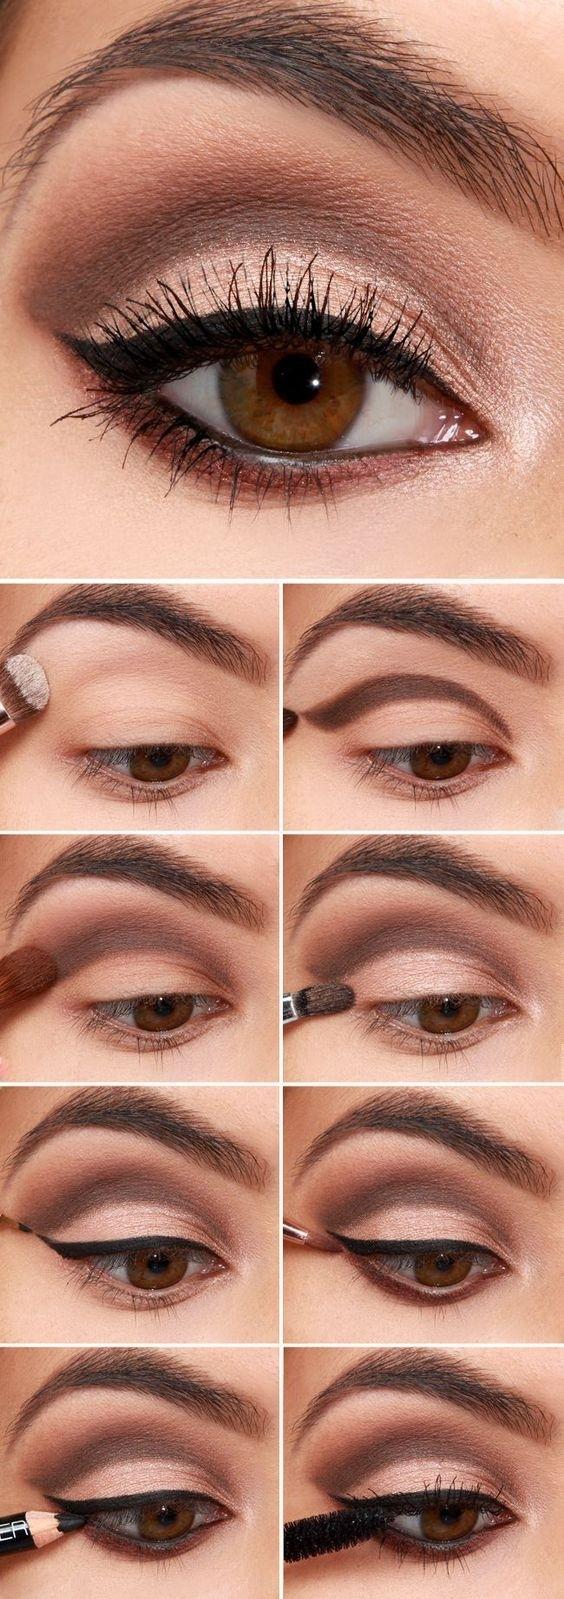 32 Easy Step By Step Eyeshadow Tutorials For Beginners | Makeup with regard to Eyeshadow Makeup Step By Step